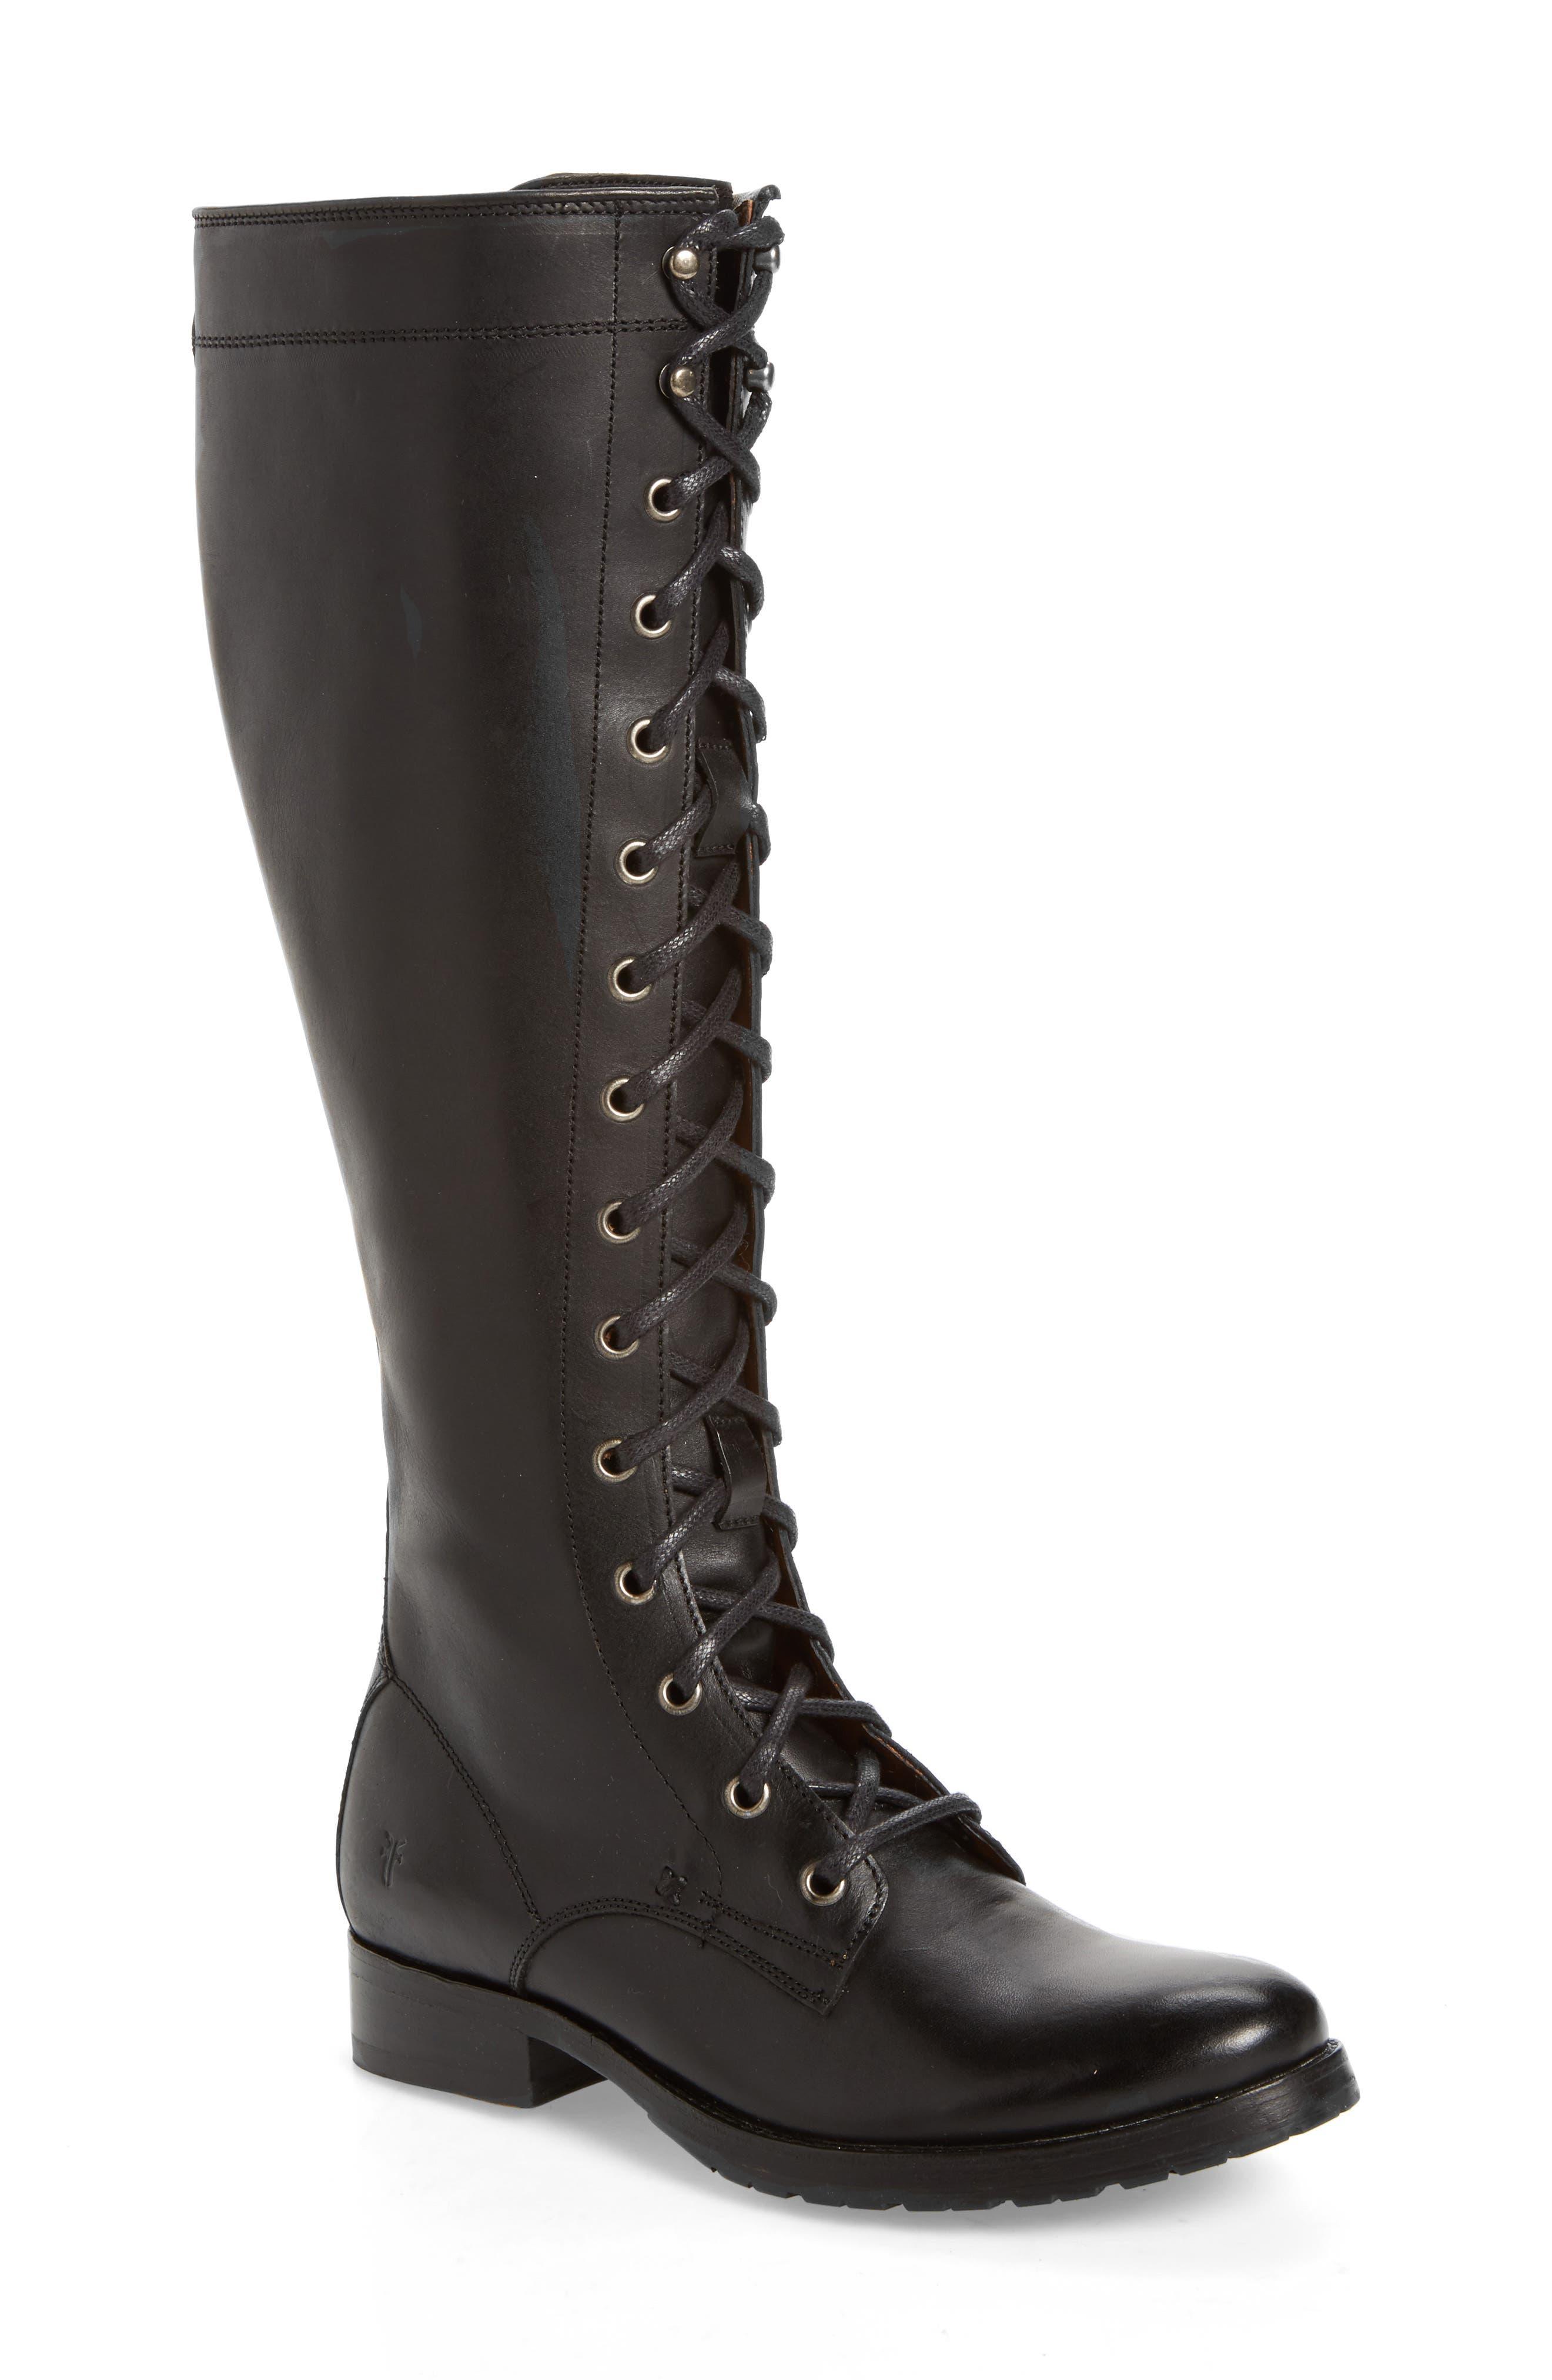 Main Image - Frye Melissa Tall Lace-Up Boot (Women)